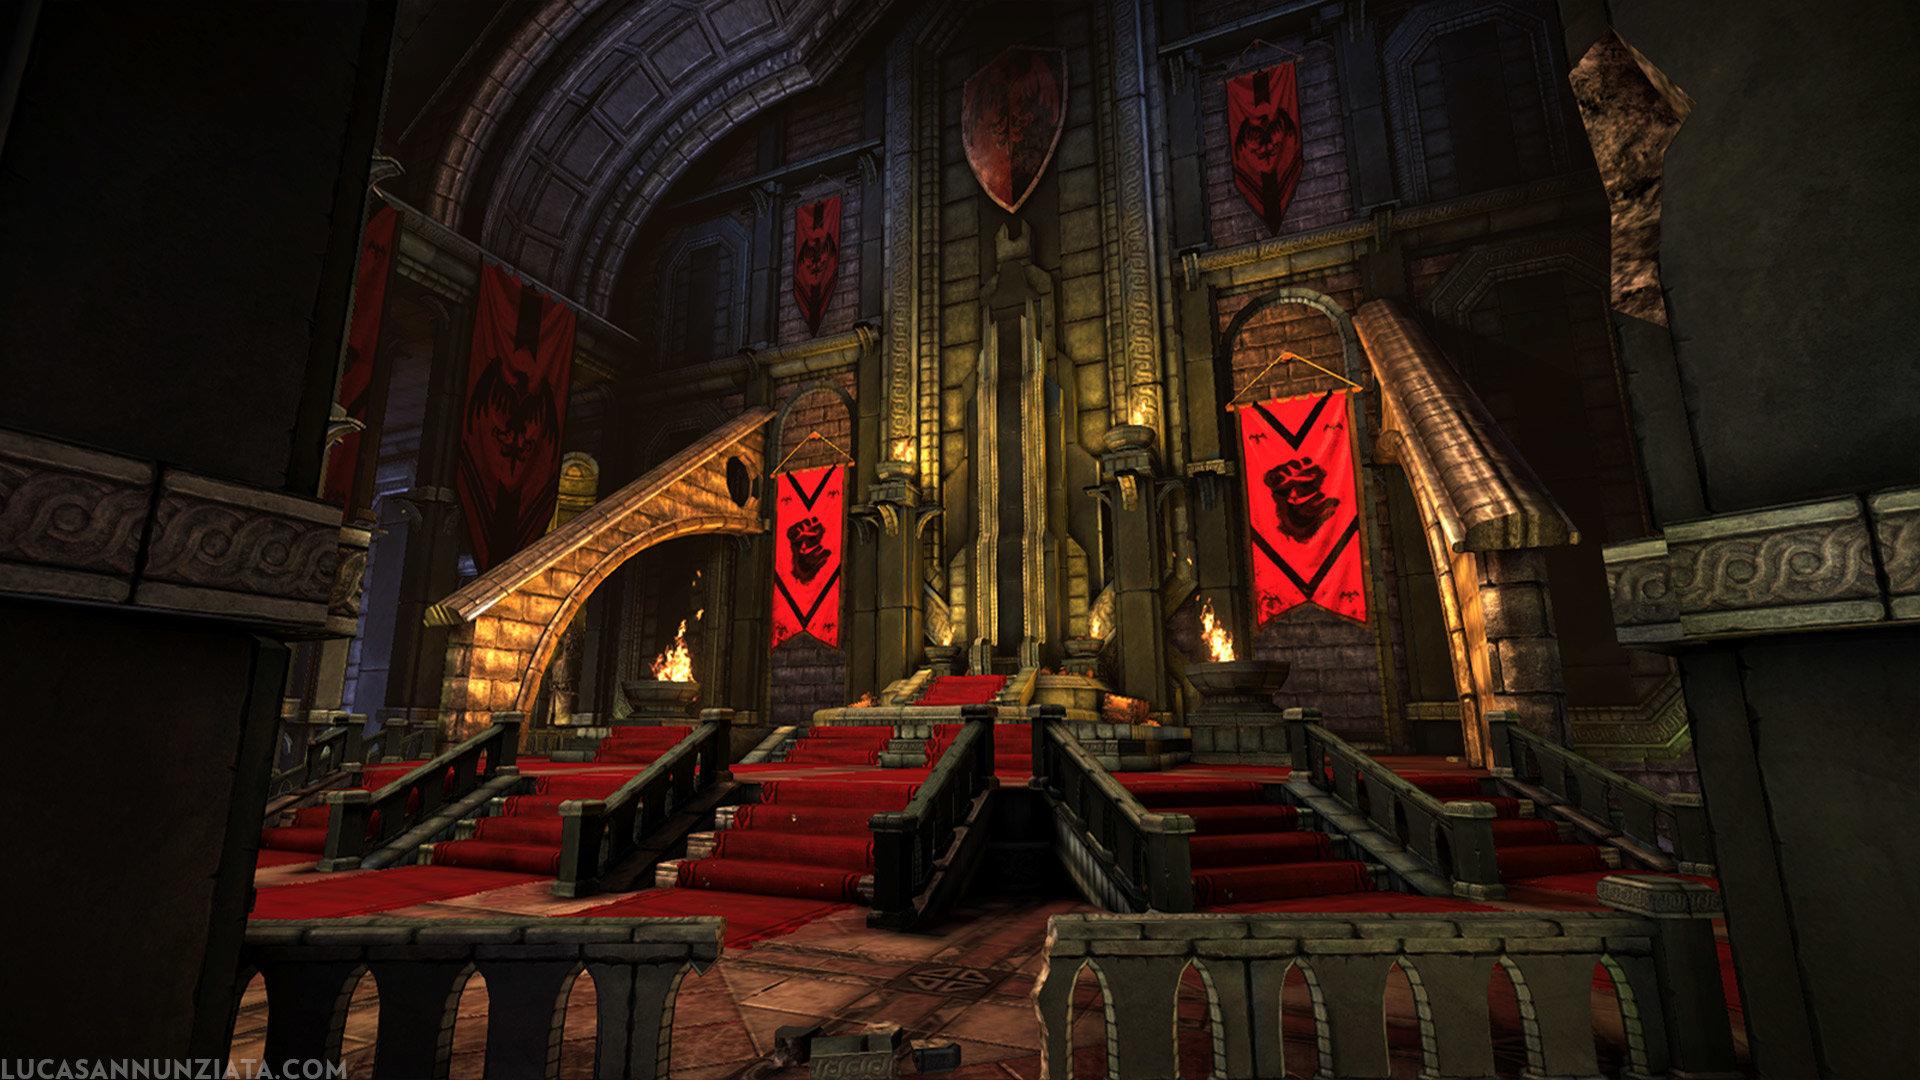 Lucas annunziata citadel 06